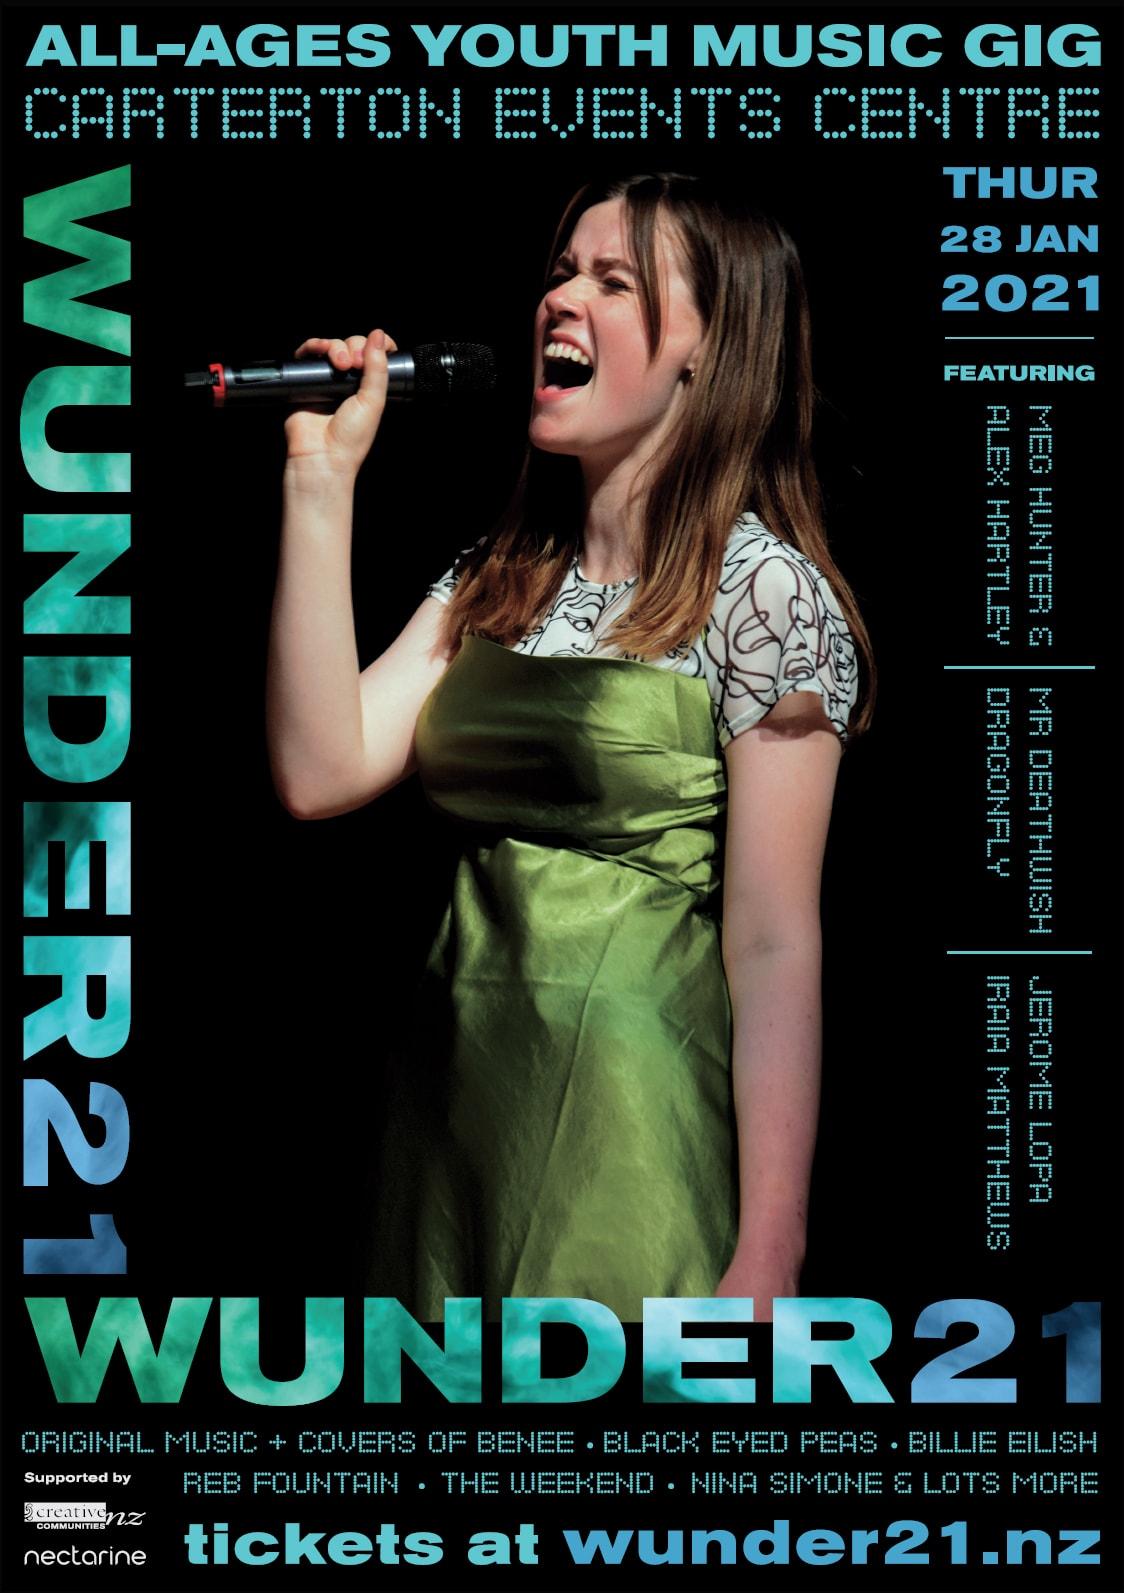 Wunder21 Poster Meg Nectarine Portfolio